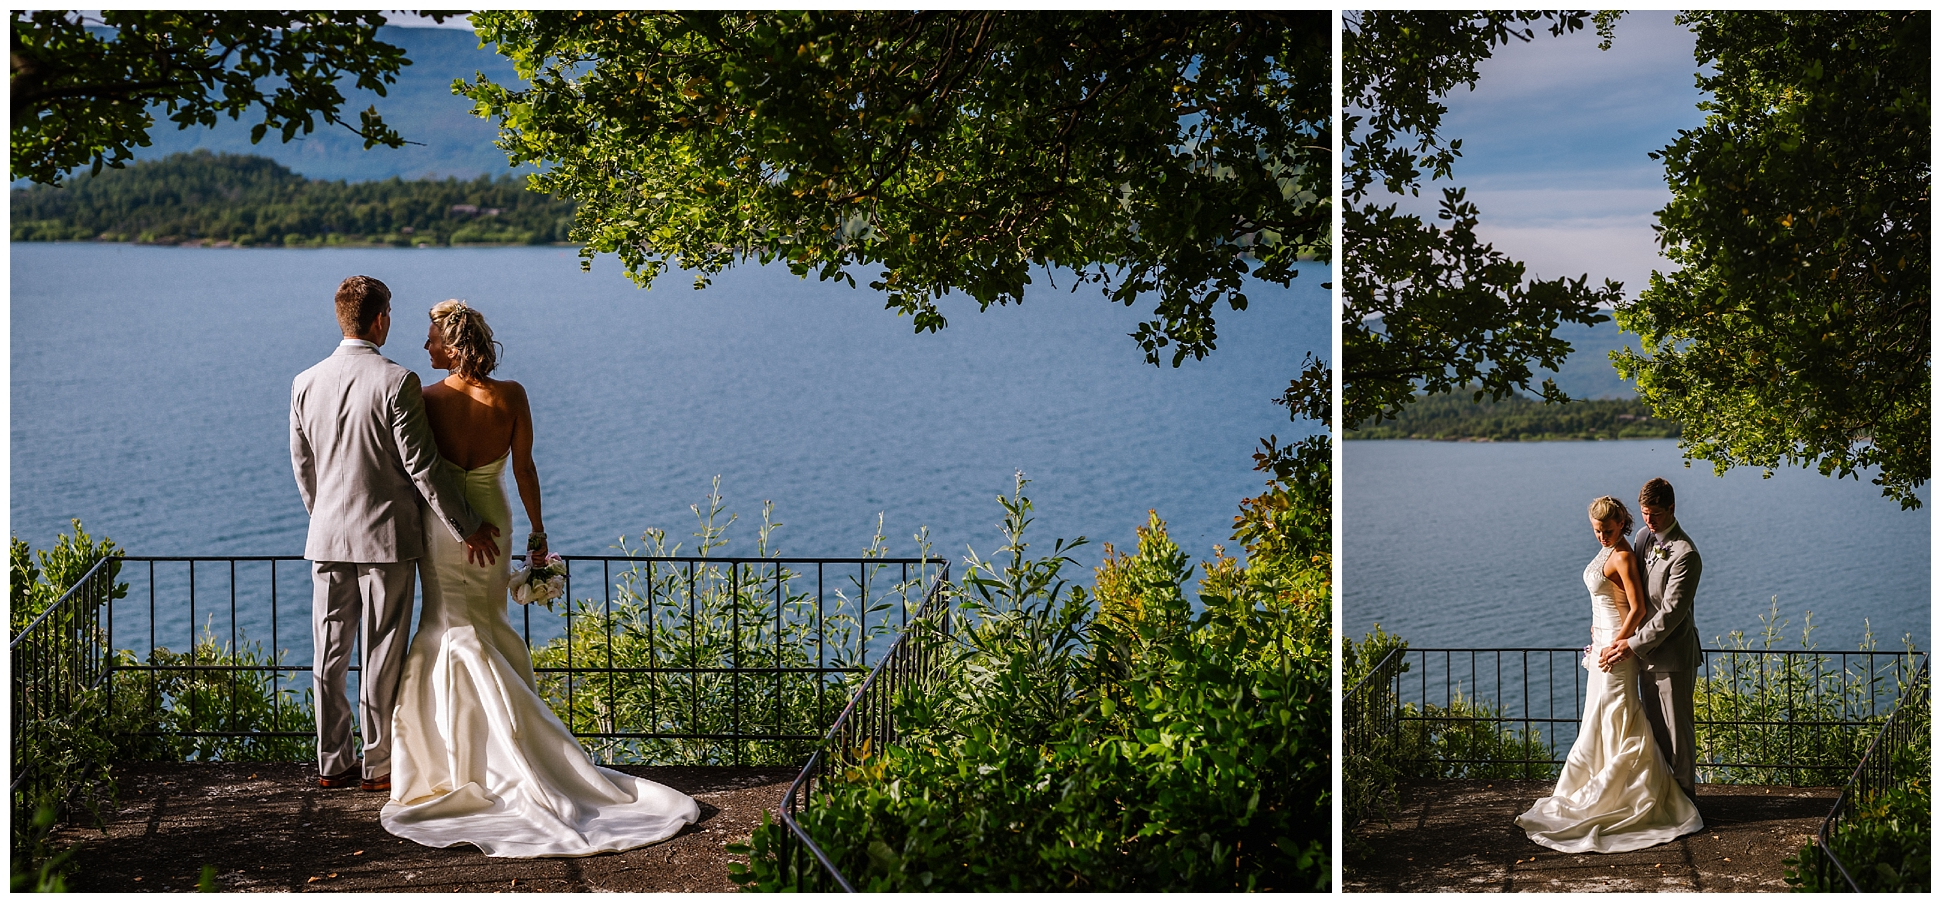 Cheilean-destination-adventure-wedding-florida-patagonia-pucon-santa-cruz-vsco_0115.jpg